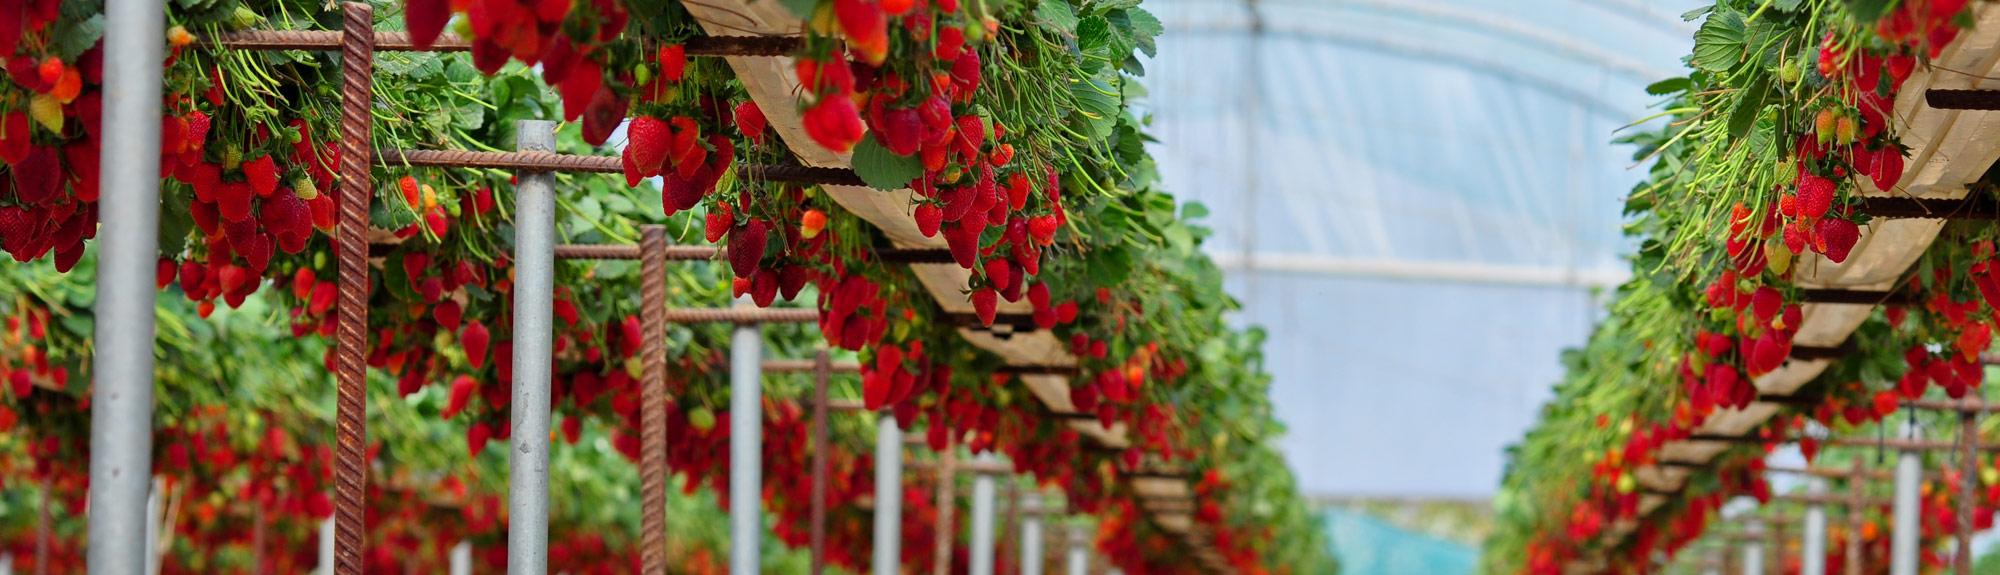 bioestimulación en berries